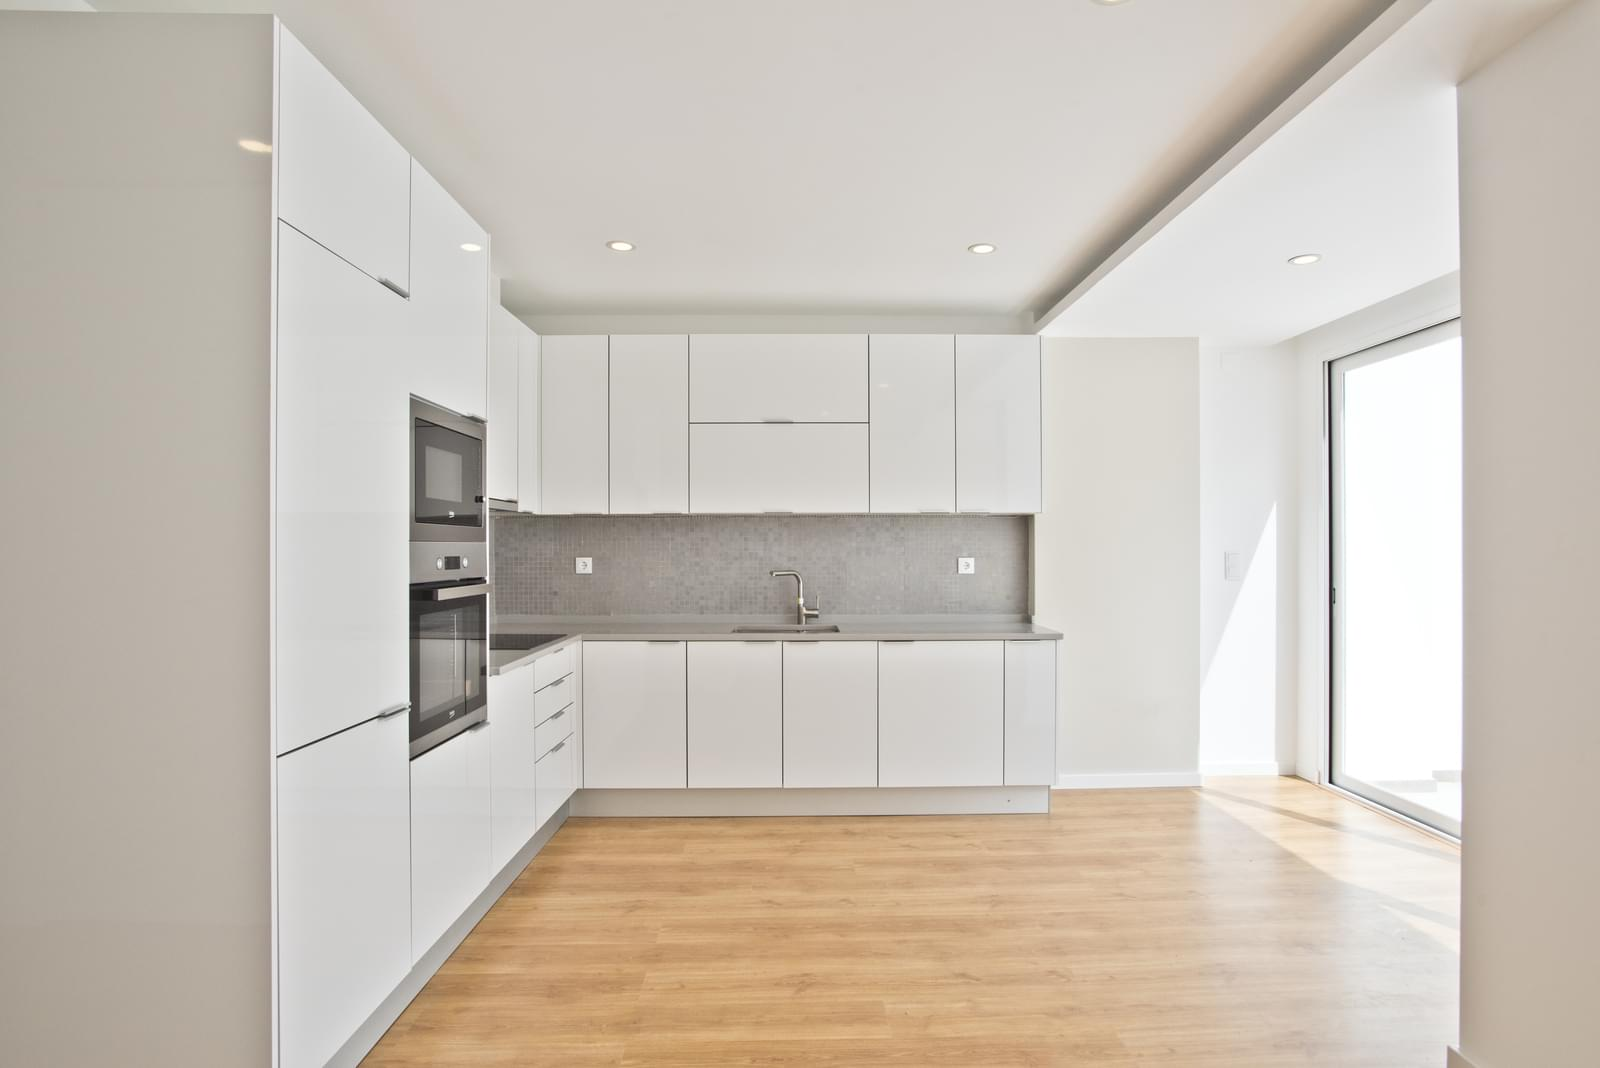 pf16986-apartamento-t2-cascais-632b5fd3-b2d4-45e0-80b0-39dfcfed63d2